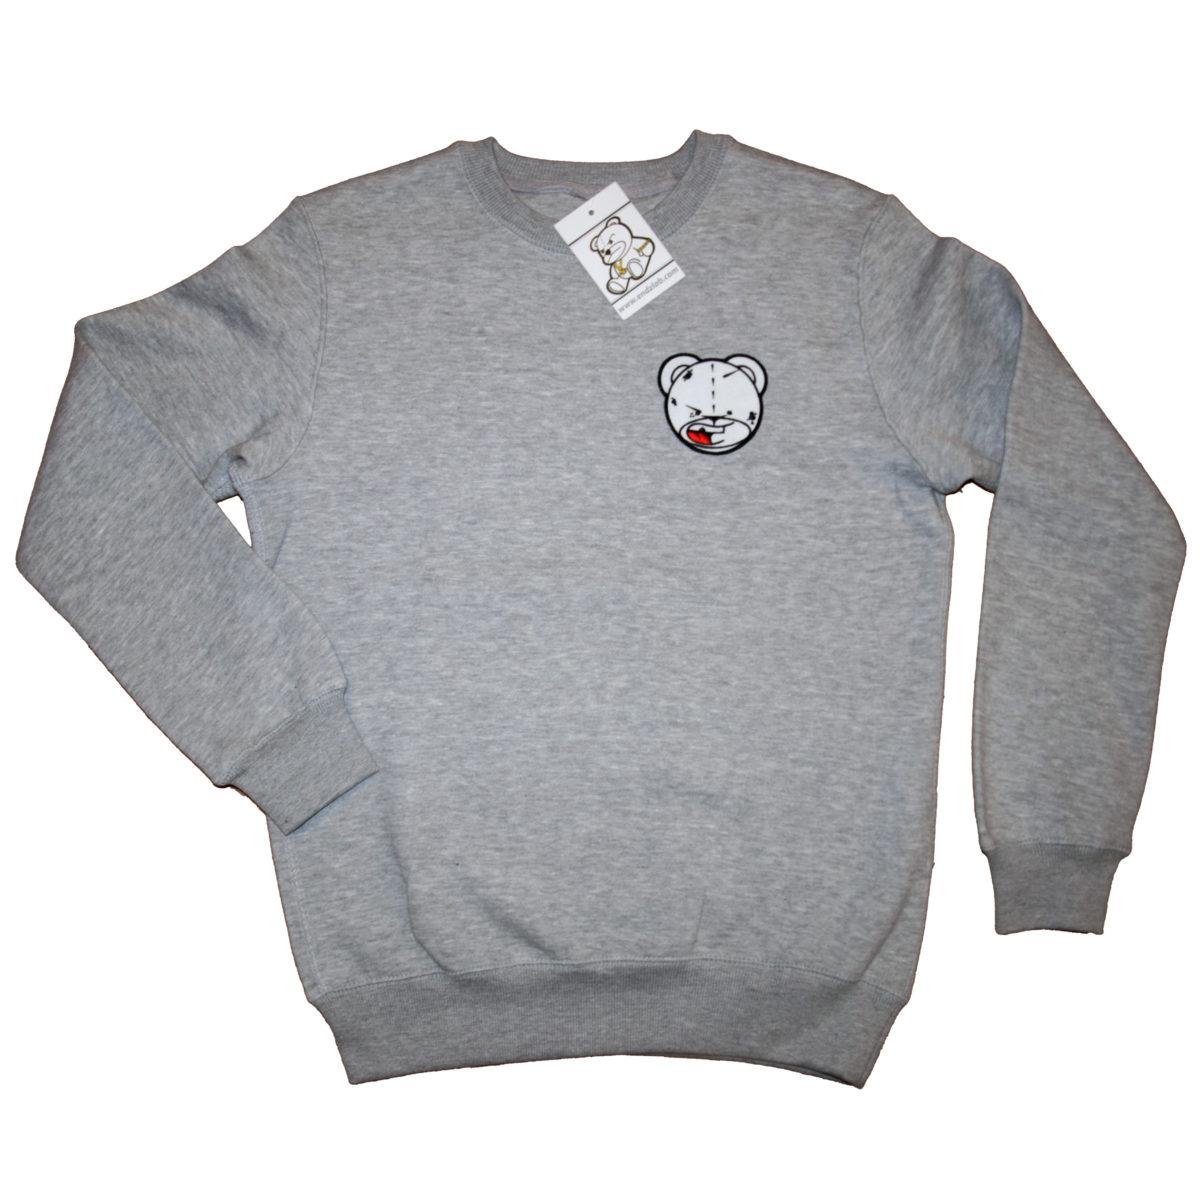 endzlab - bad ass sweatshirt grey